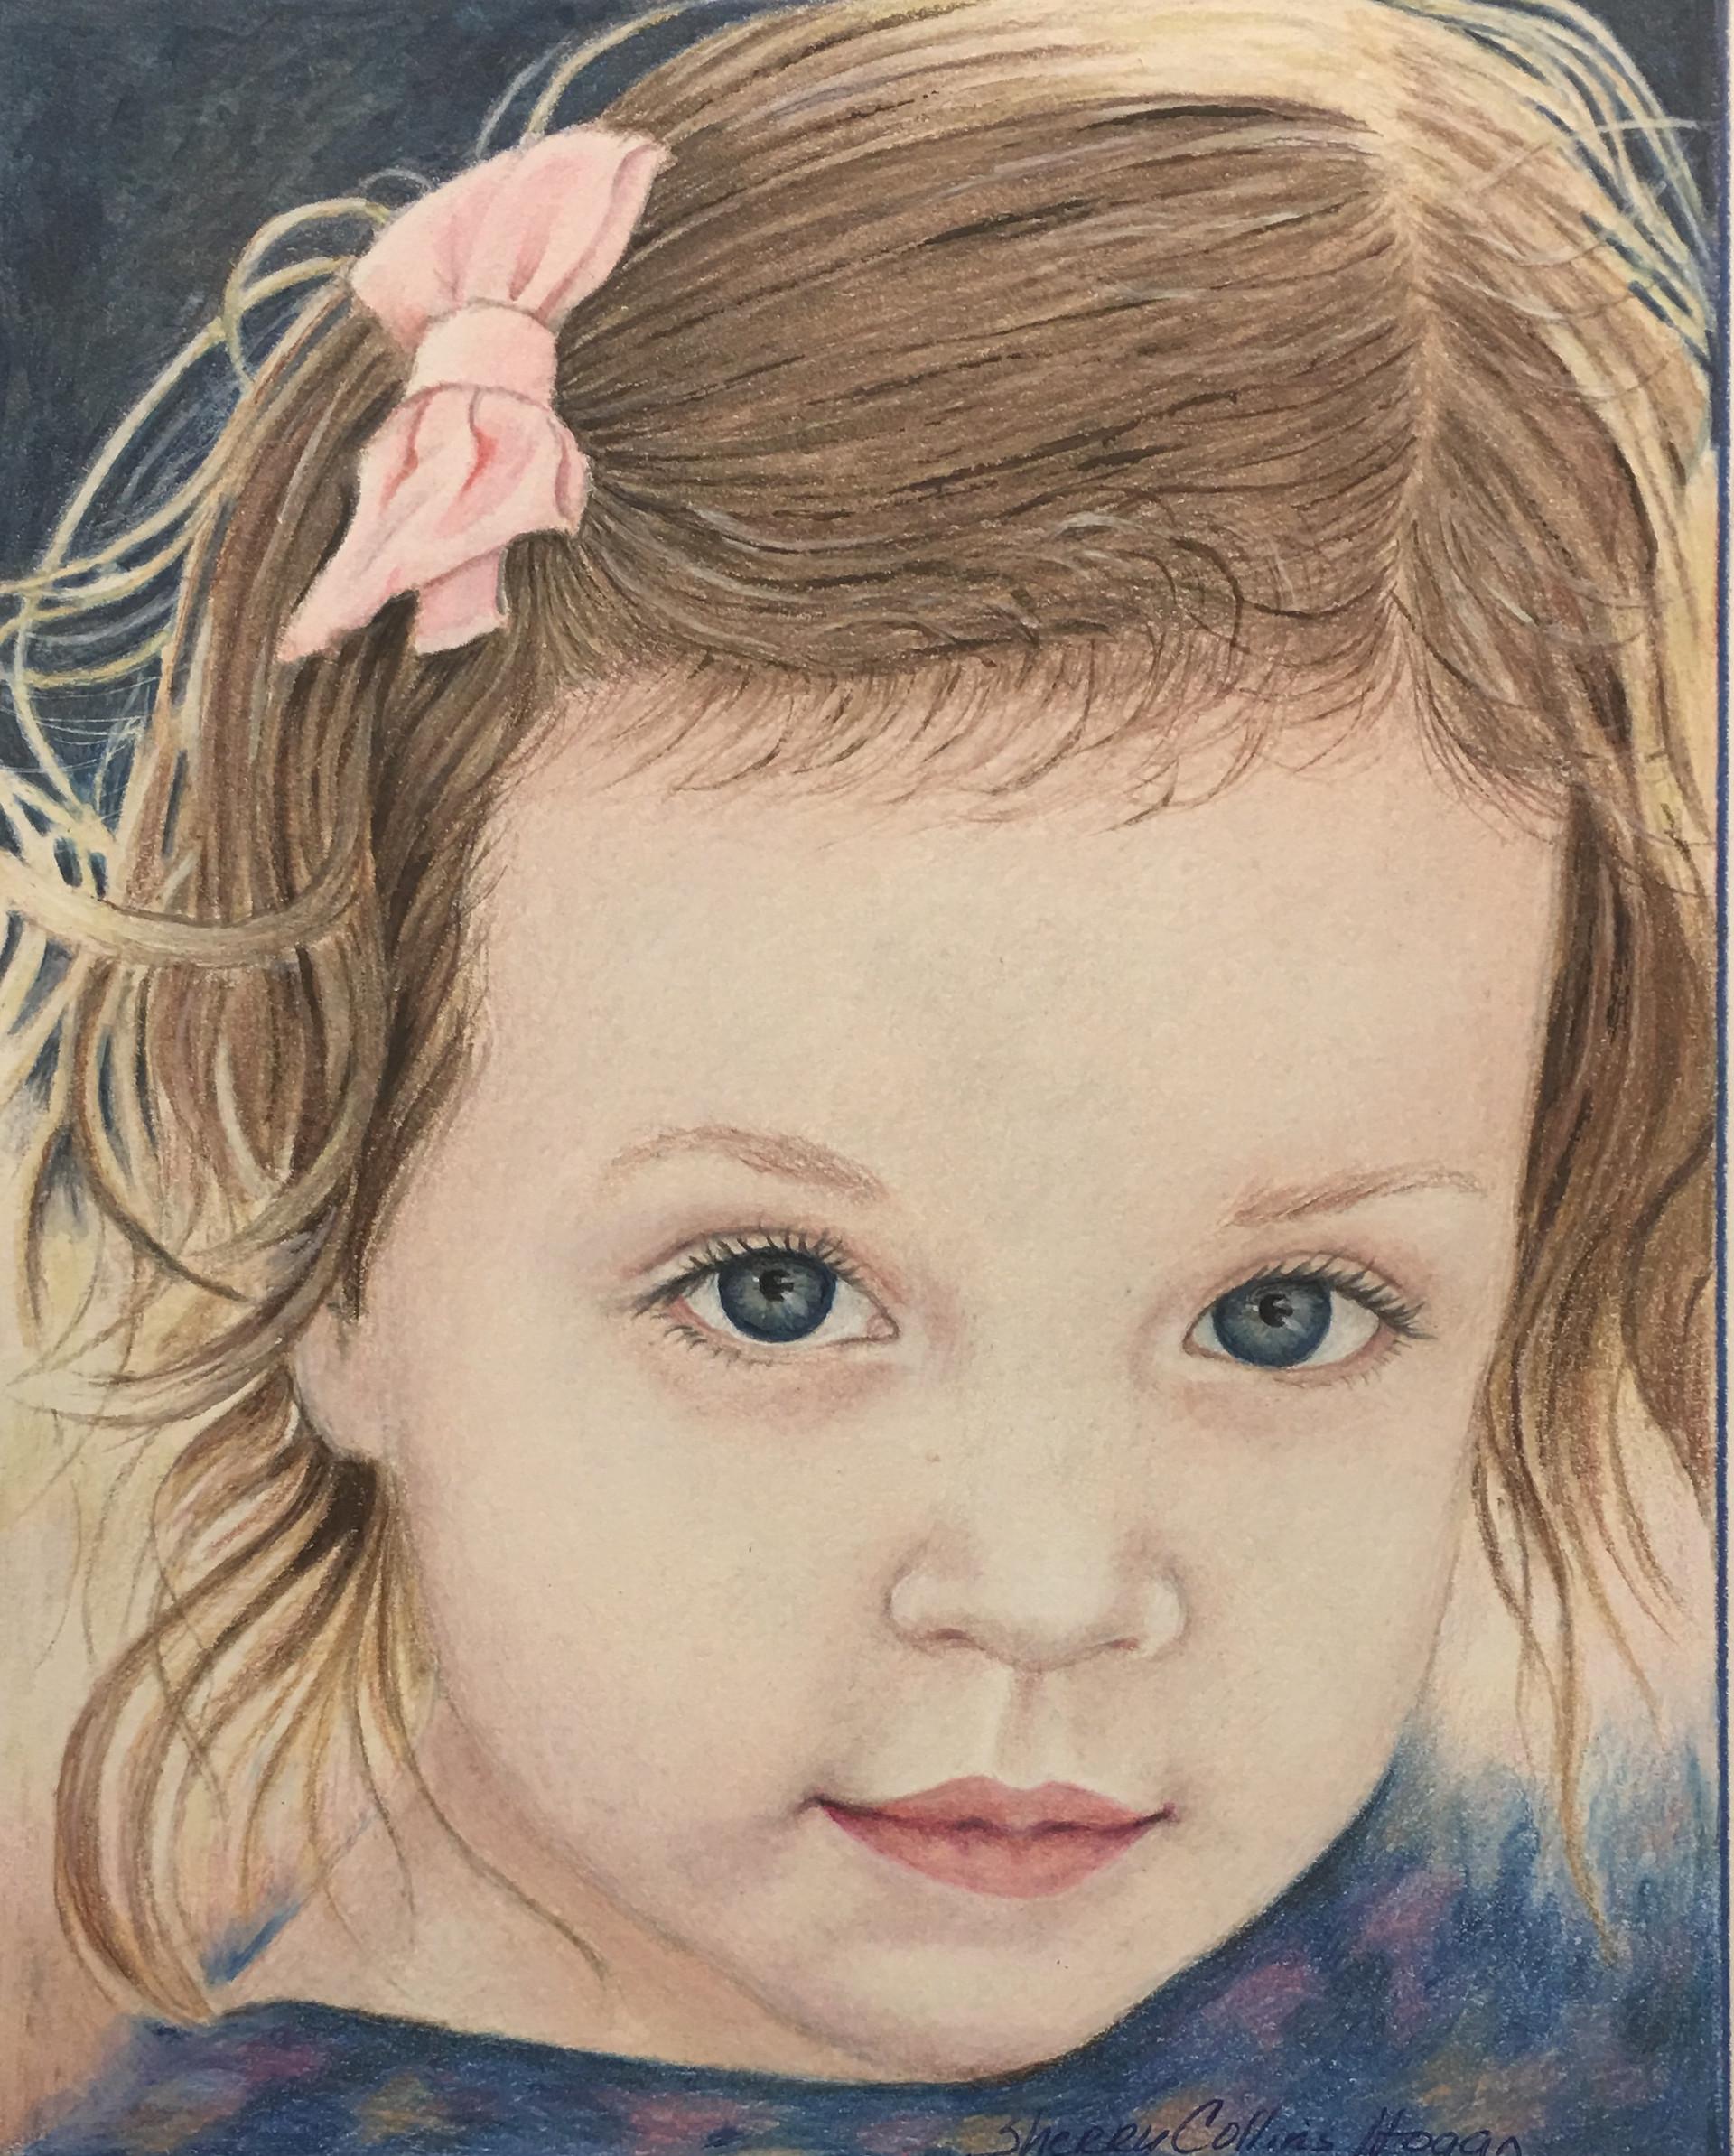 Portraits and Commissions